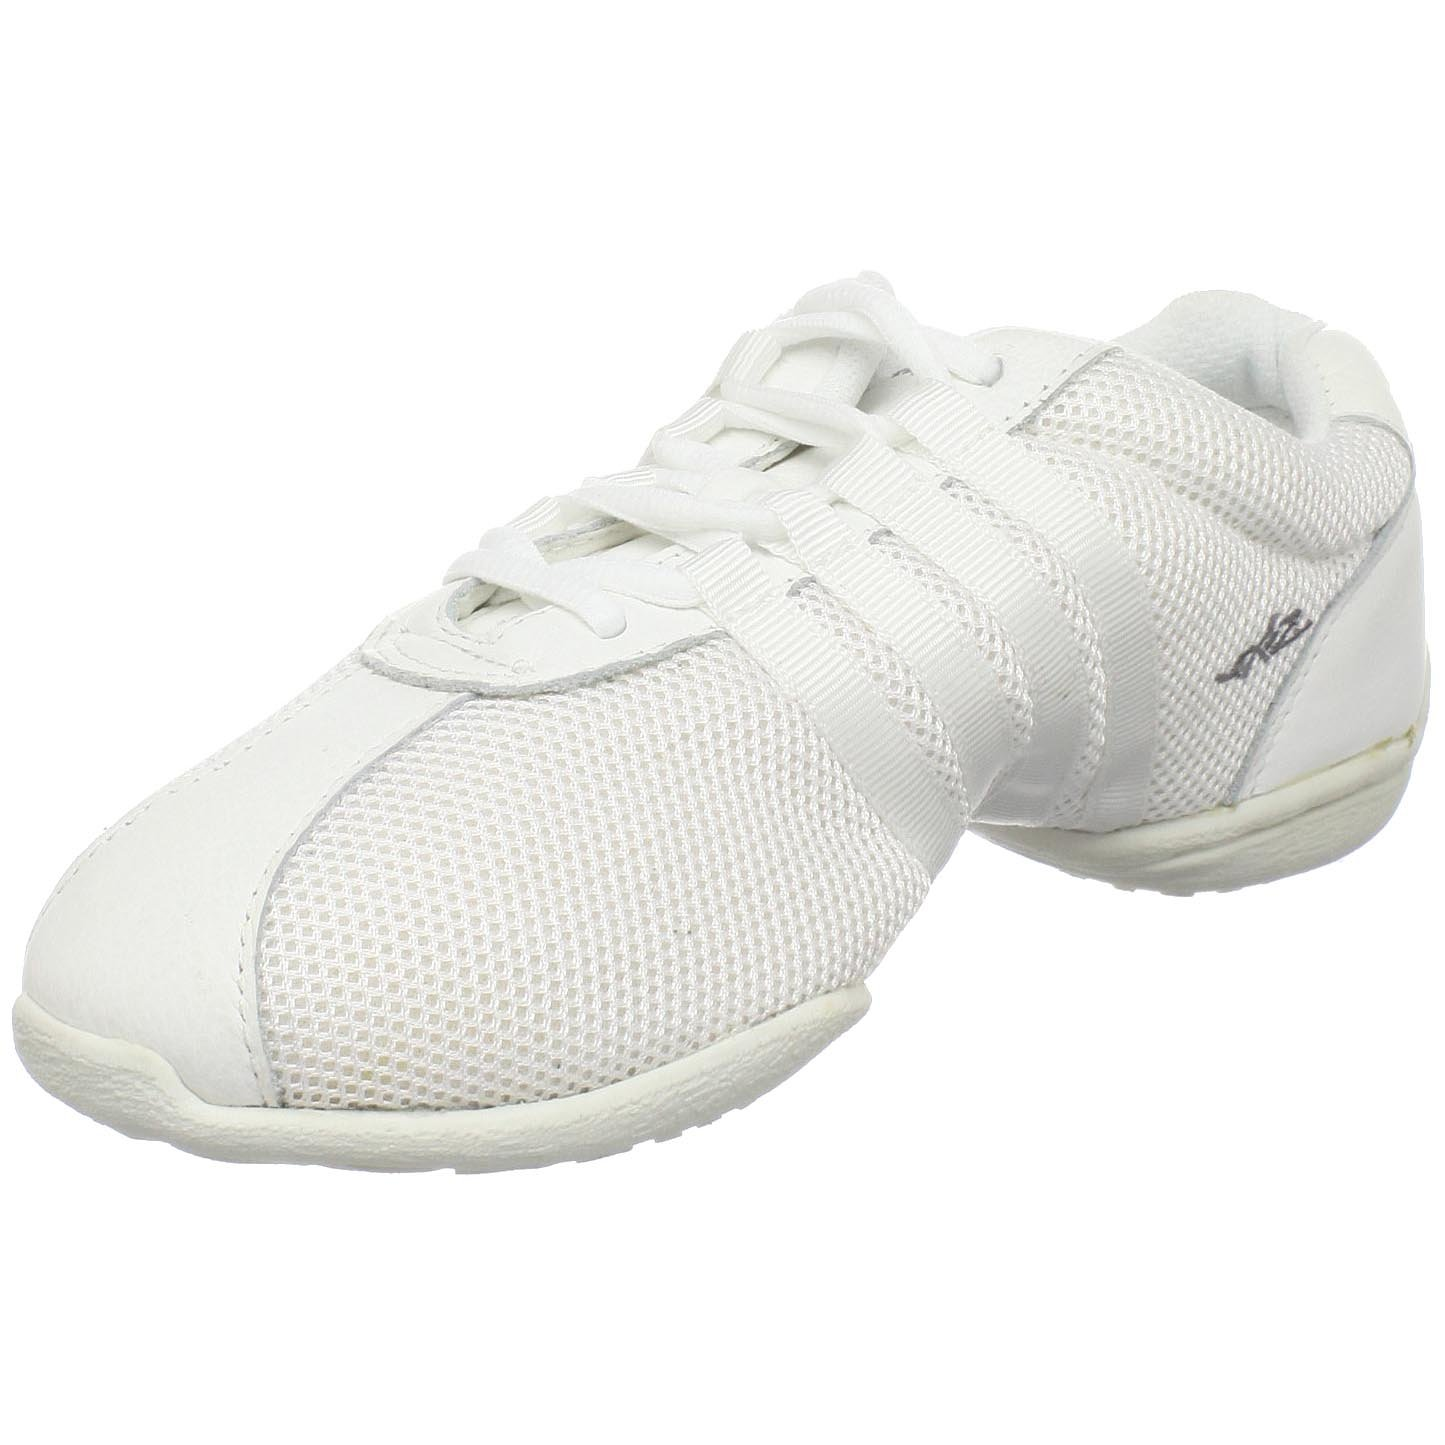 Sansha Dyna-Site Dance Sneaker S37M